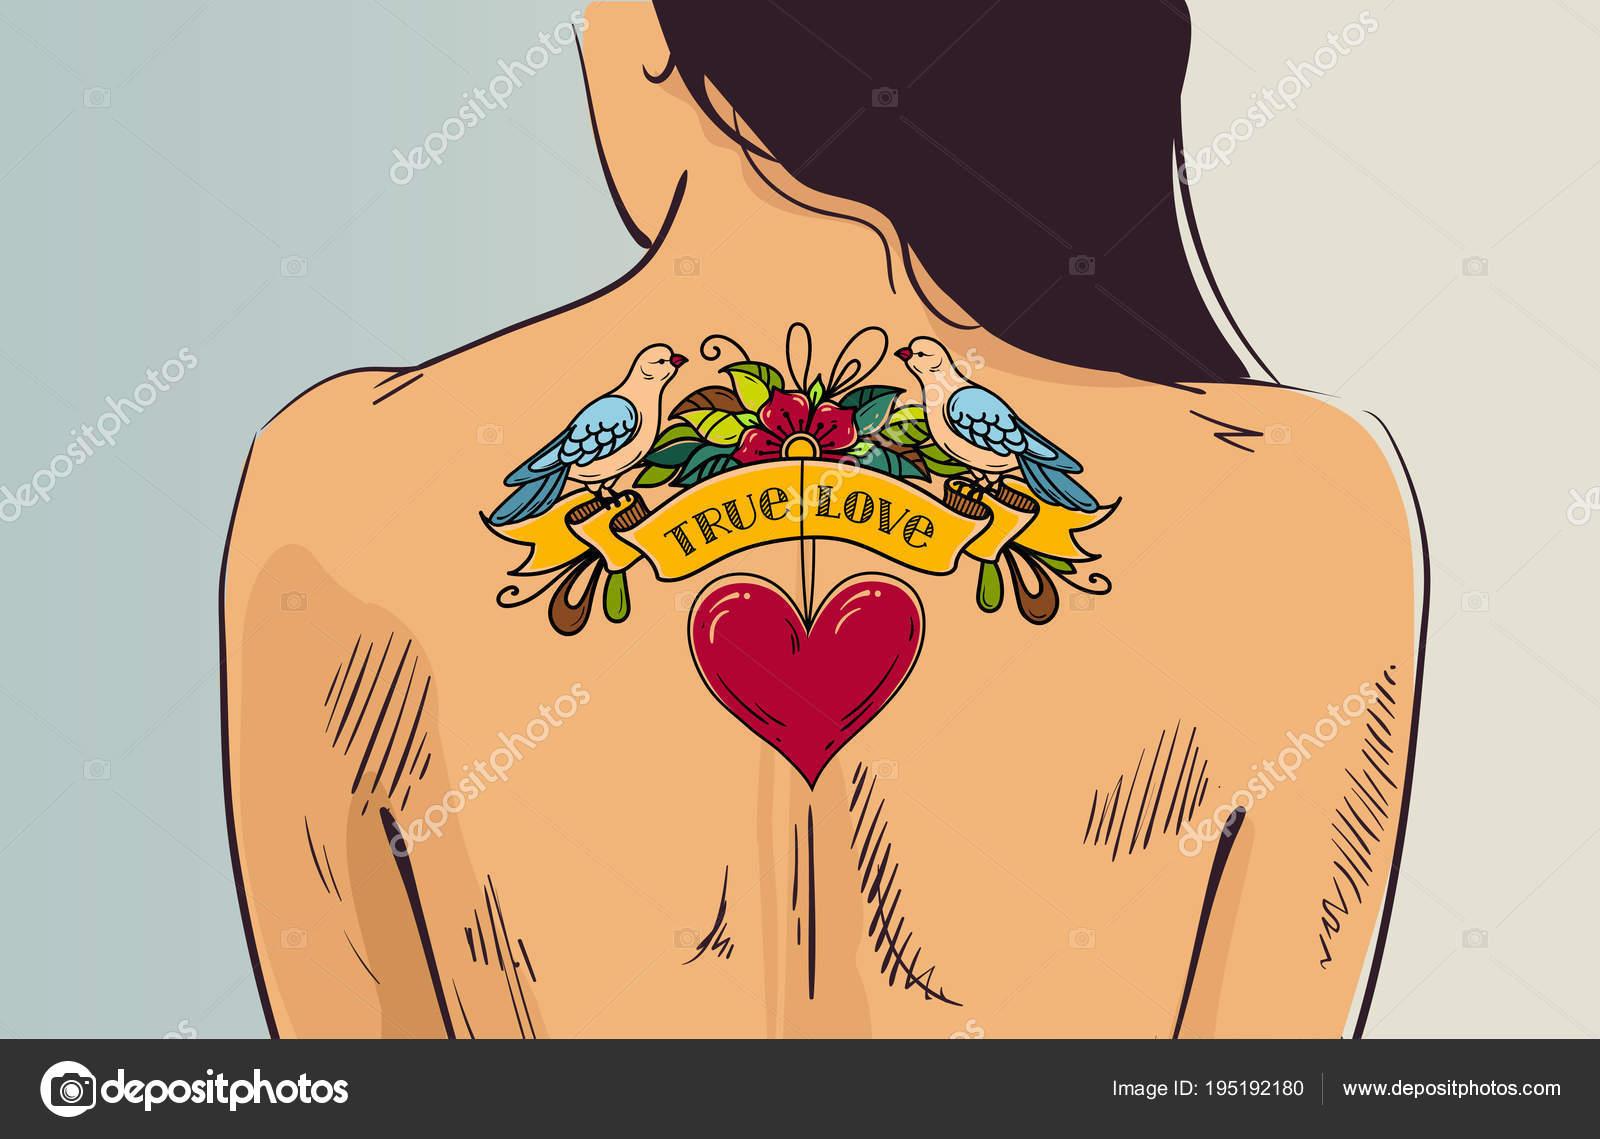 Chica Con Tatuaje Romántico Mujer De Vuelta Con La Espalda Tatuaje